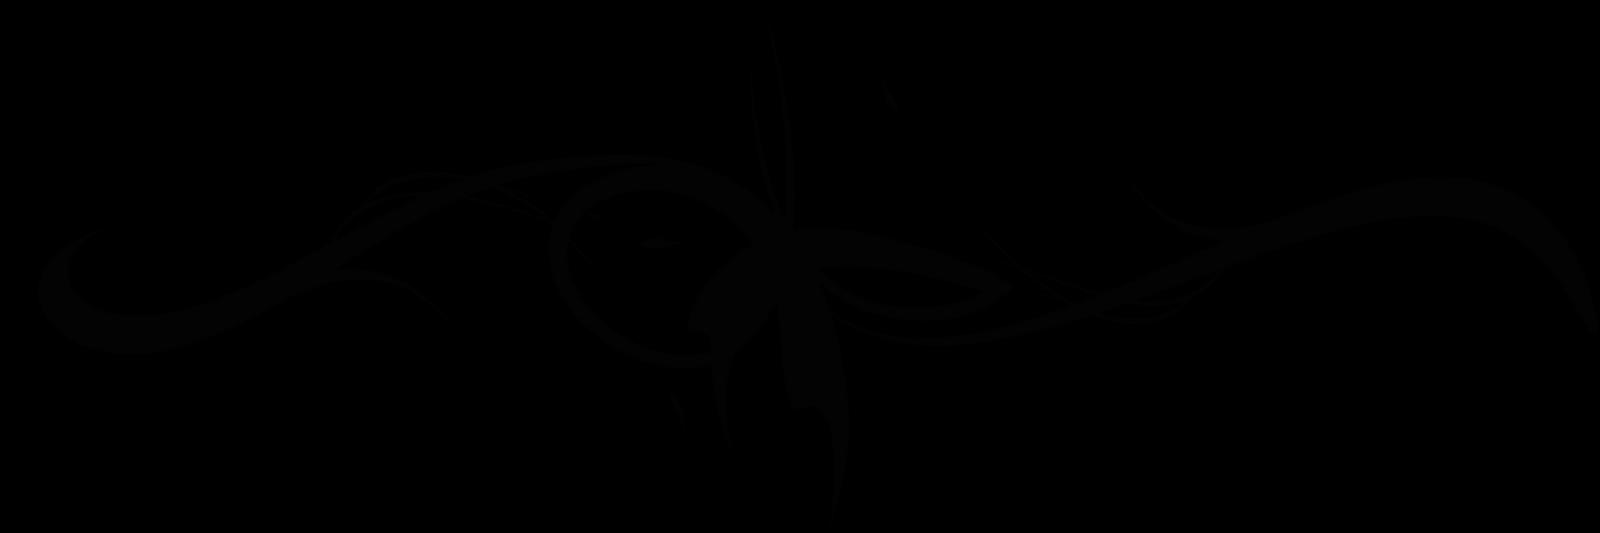 image 26f73621147427e77d0dde1119e7ca14 dividers clipart divider rh lakewood academy highschool wikia com clip art dividers free download clip art dividers and borders